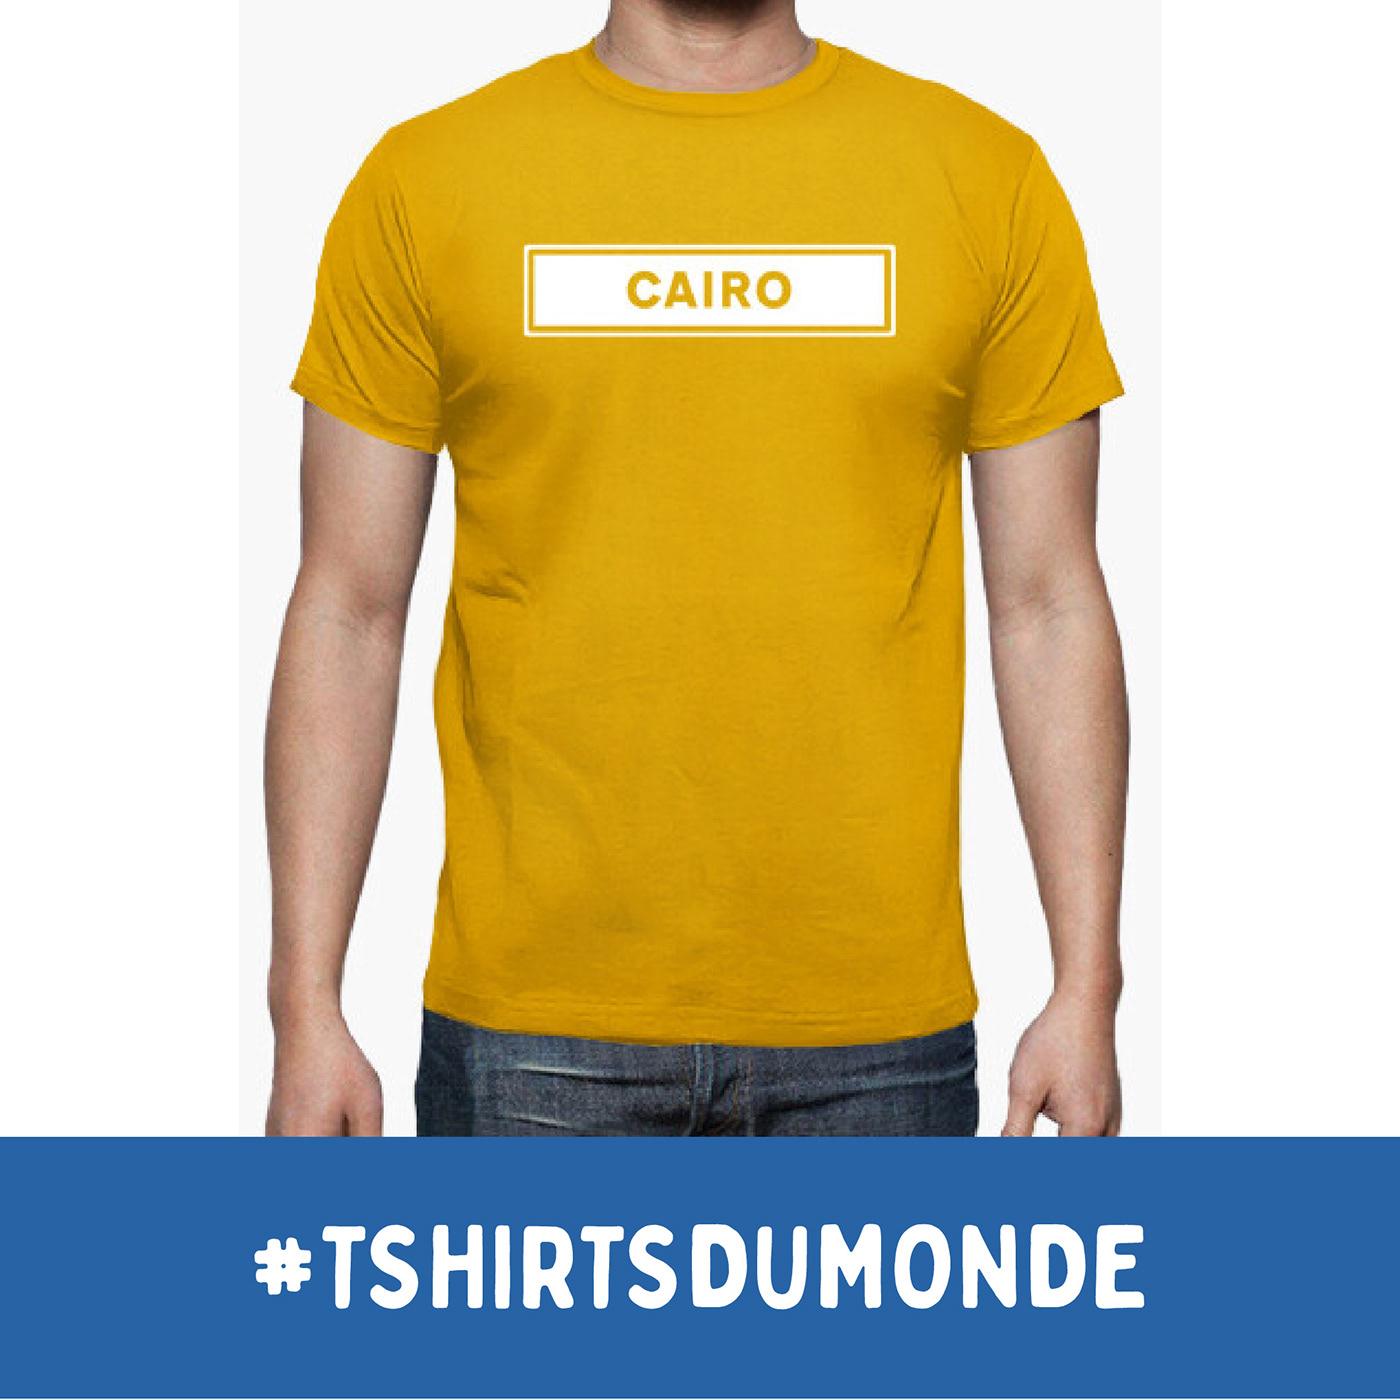 CAIRO / T-SHIRTS DU MONDE Collection, by Brassens Studio / ©Tomás Sastre